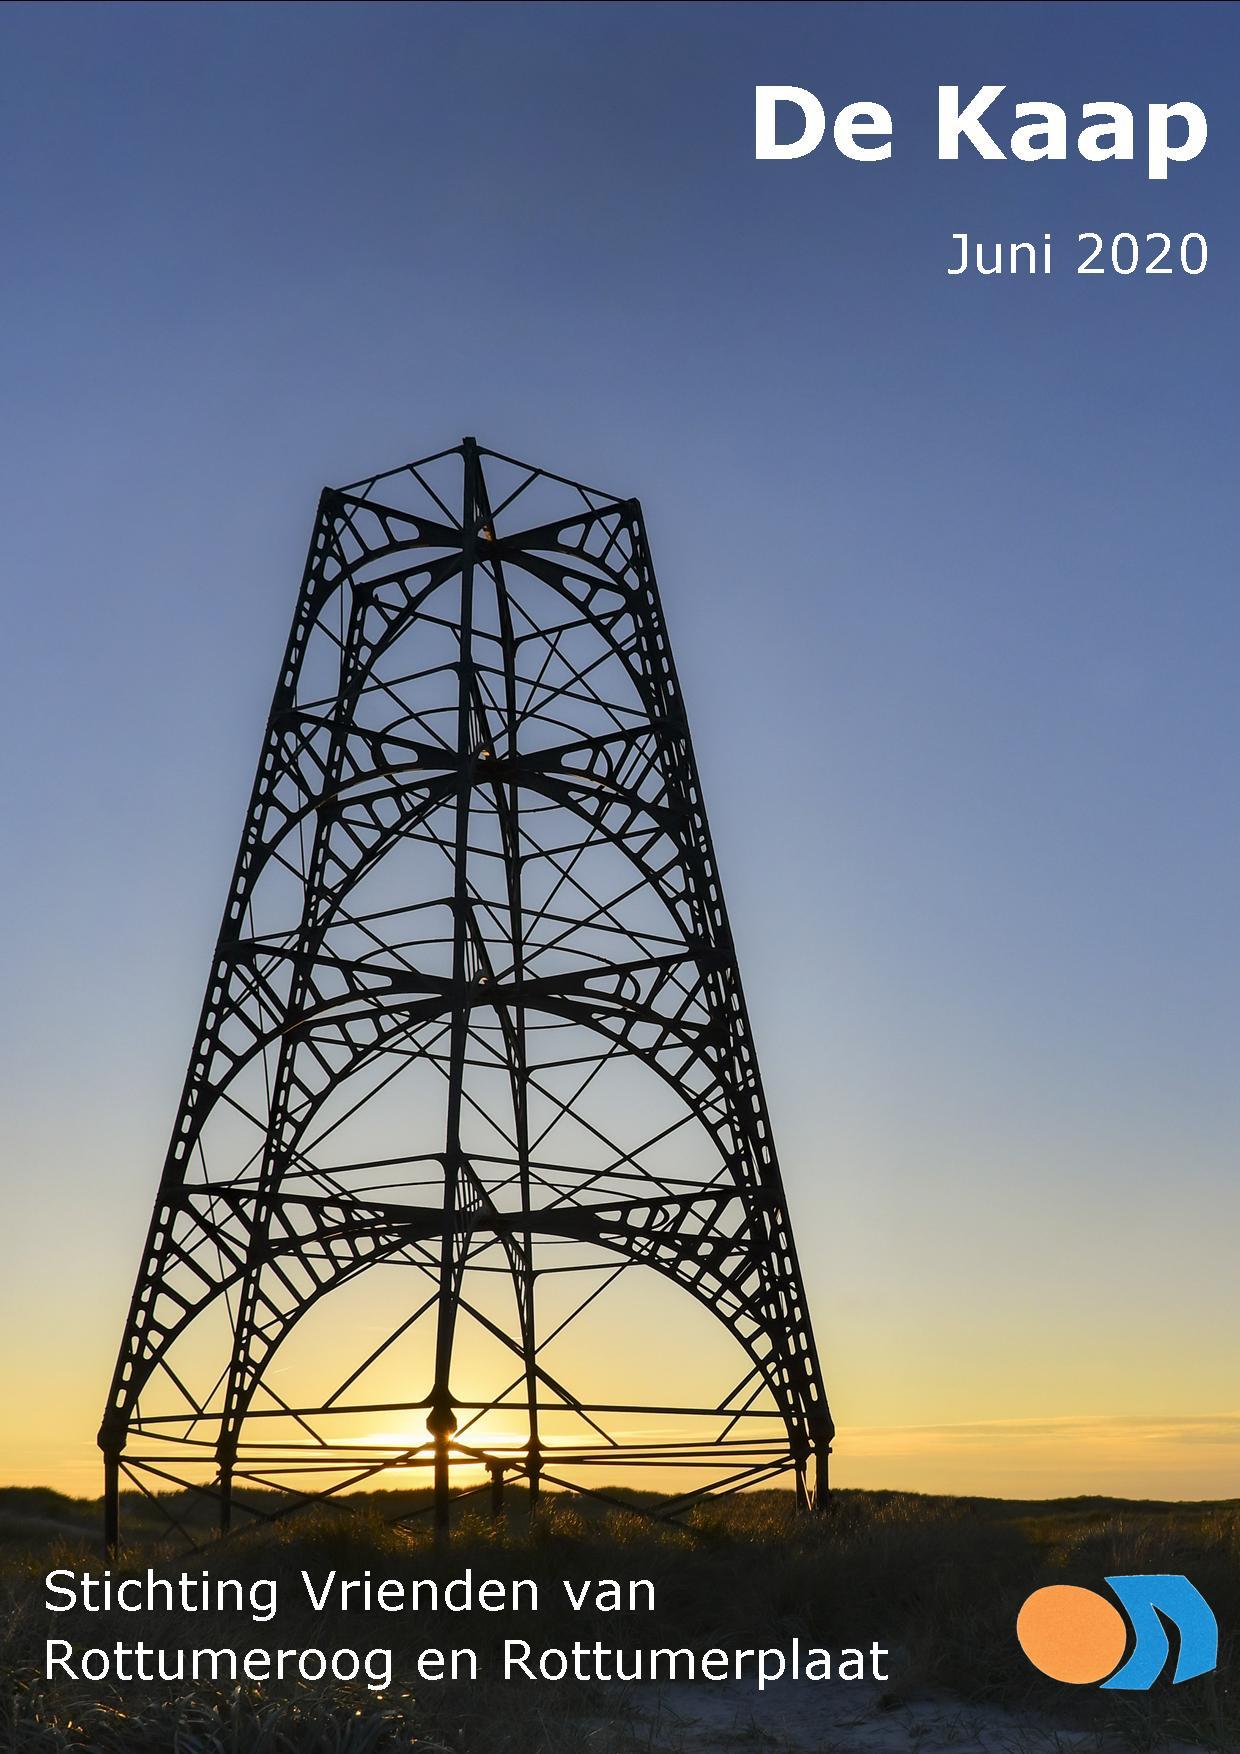 De Kaap juni 2020